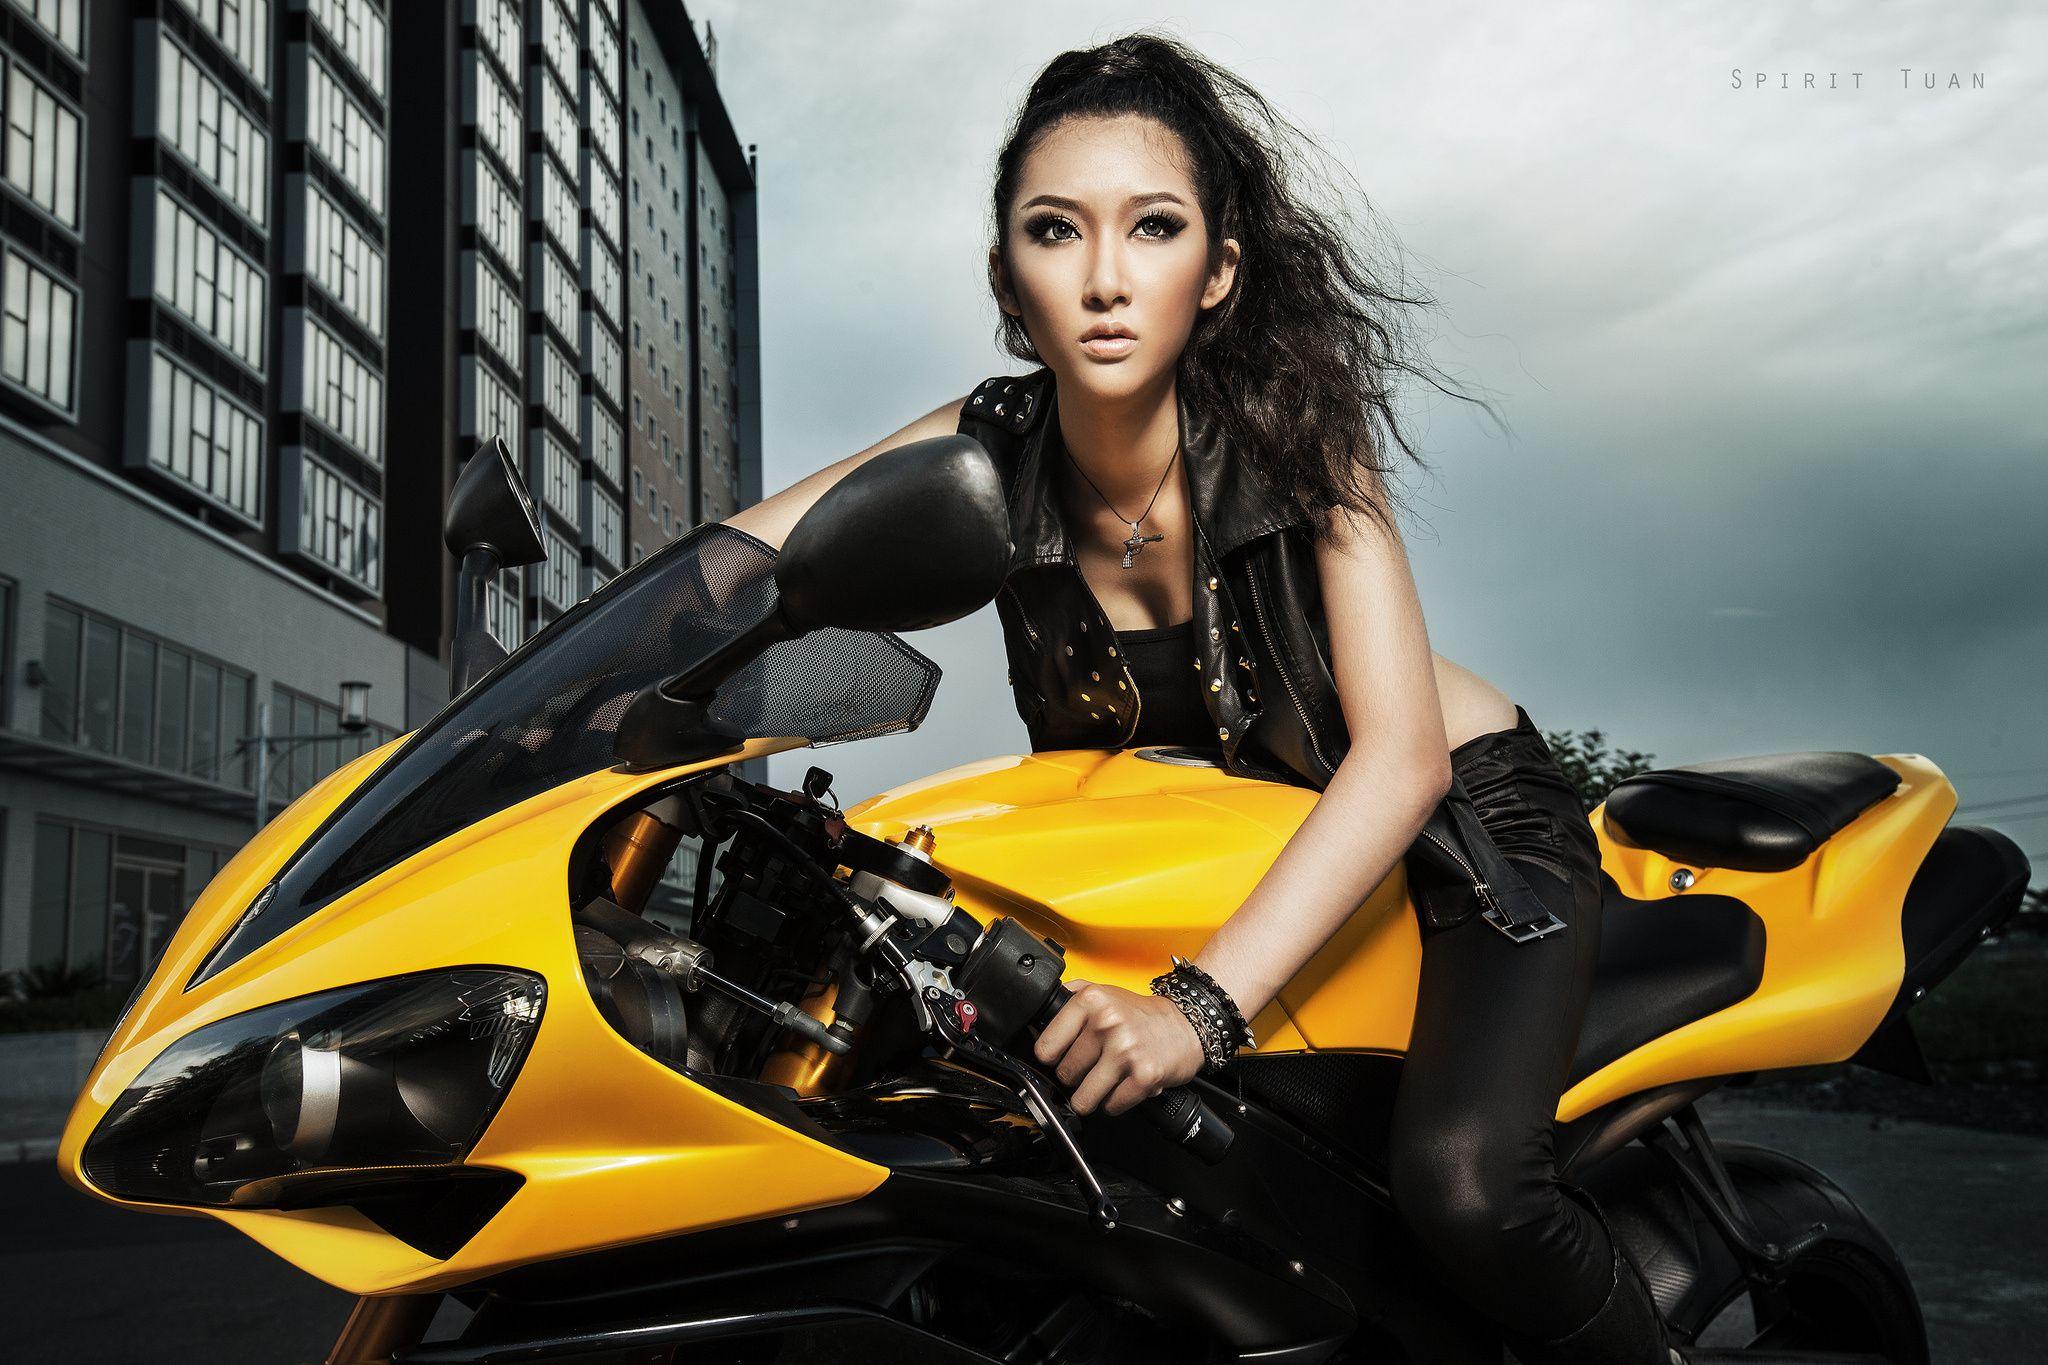 Motorcycle Girl Wallpaper: Kelly Khoa Nguyen Asian Bike